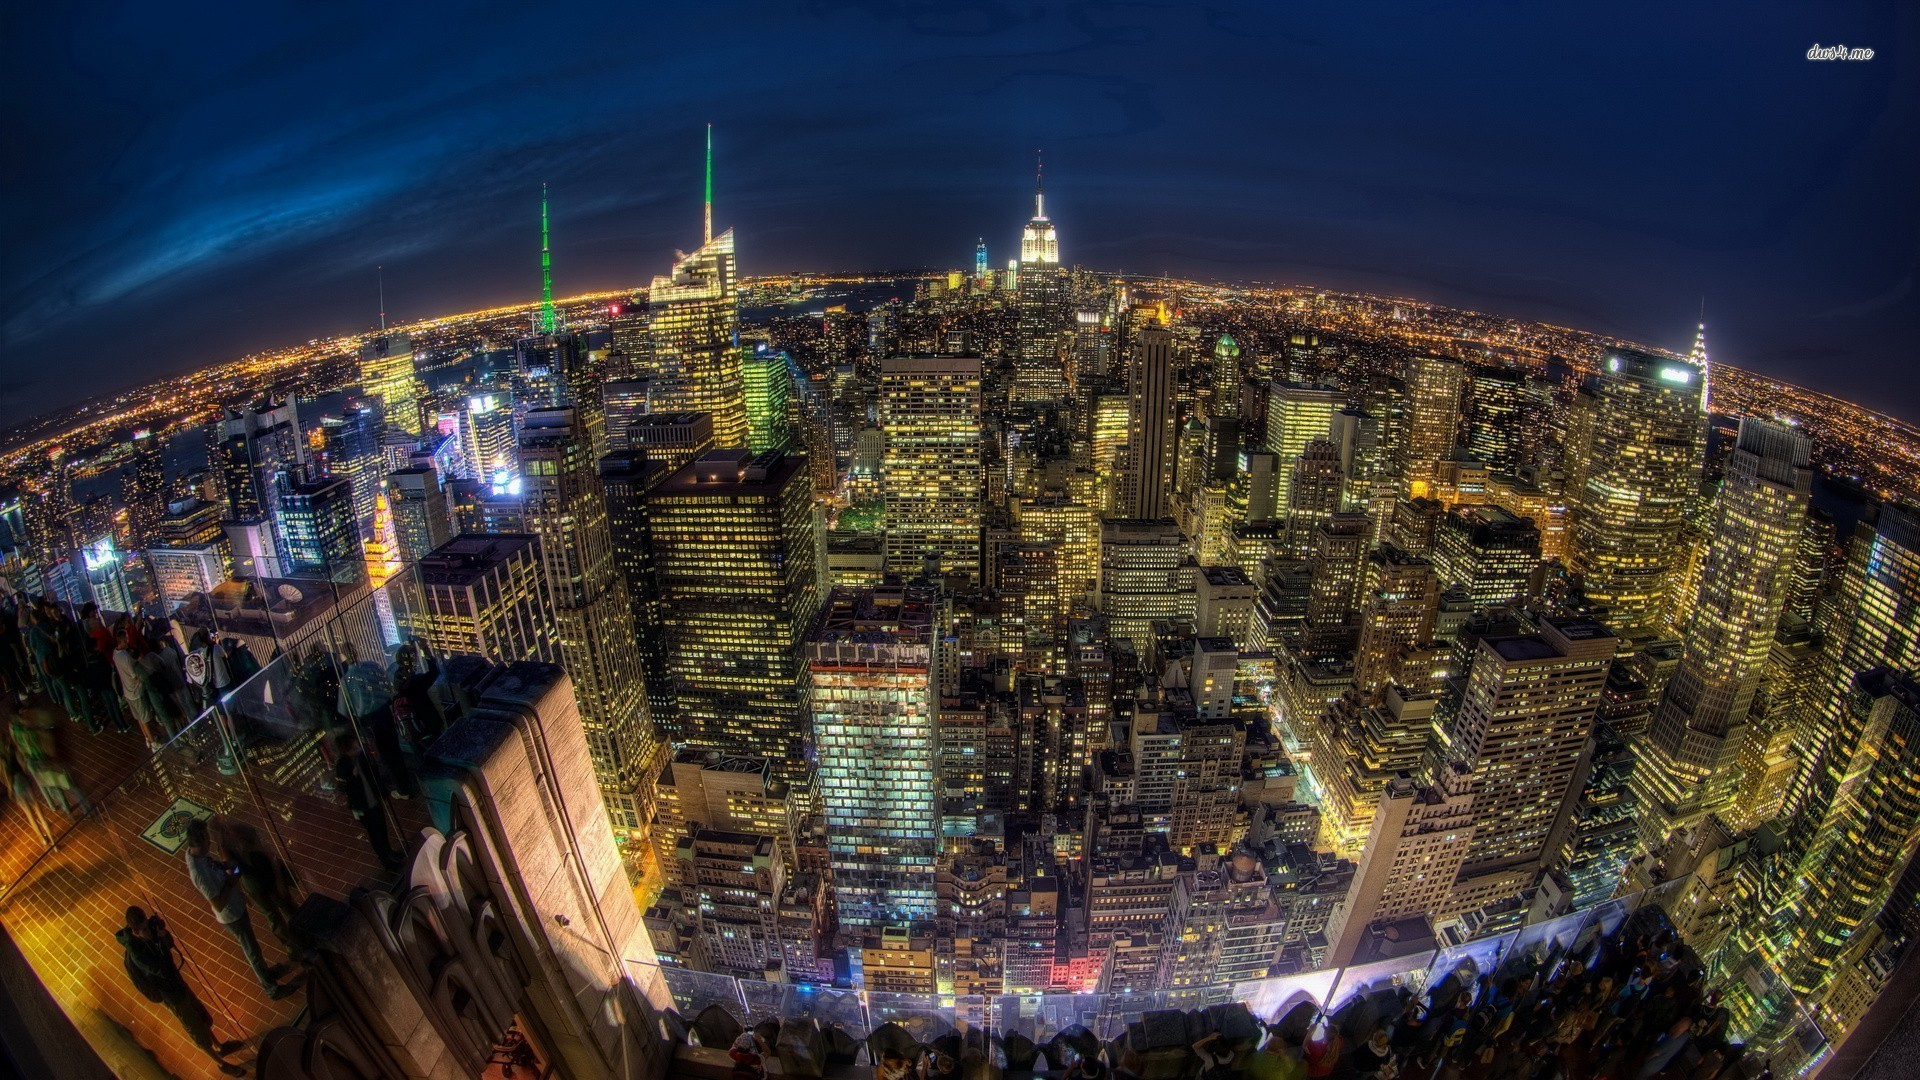 New York City lights World HD desktop wallpaper, New York City wallpaper,  New York wallpaper, Big Apple wallpaper, USA wallpaper – World no.